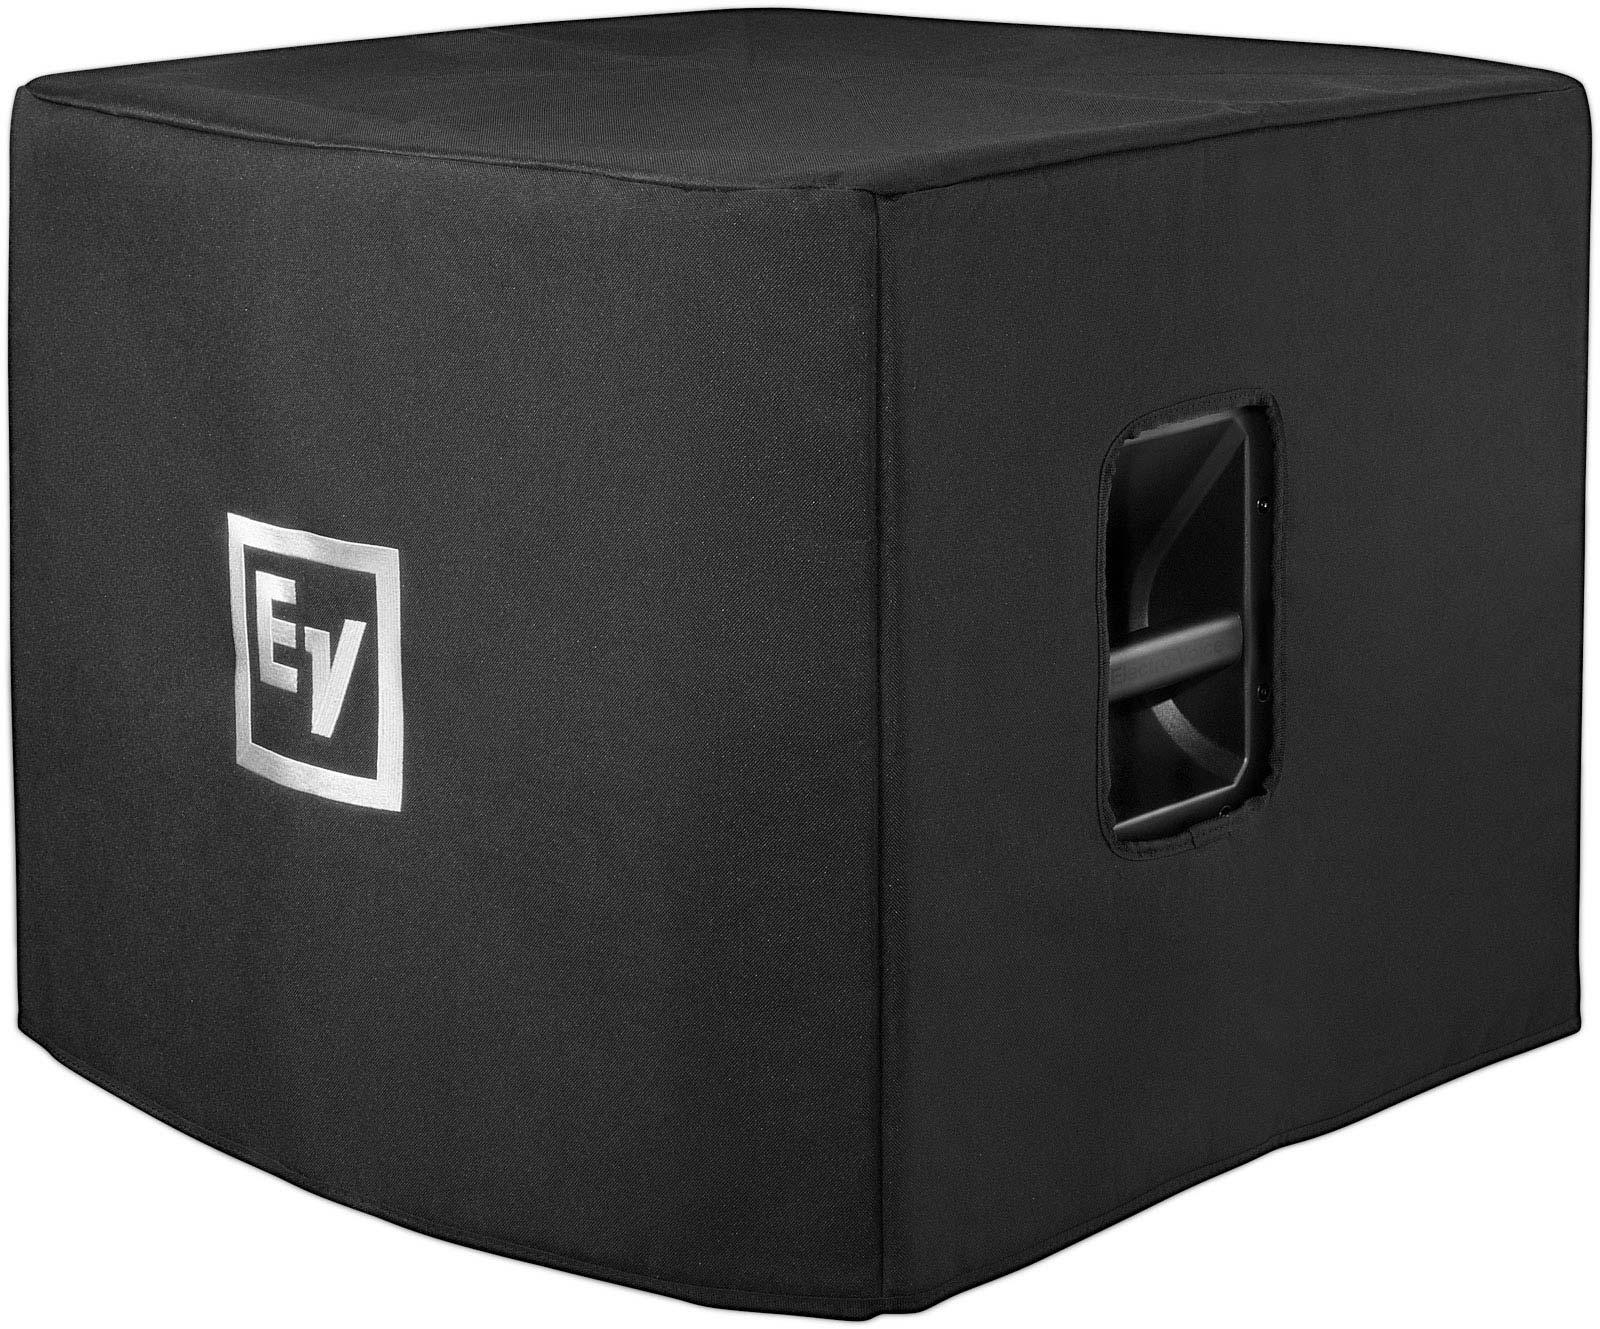 Electrovoice Ekx-18sp-cvr